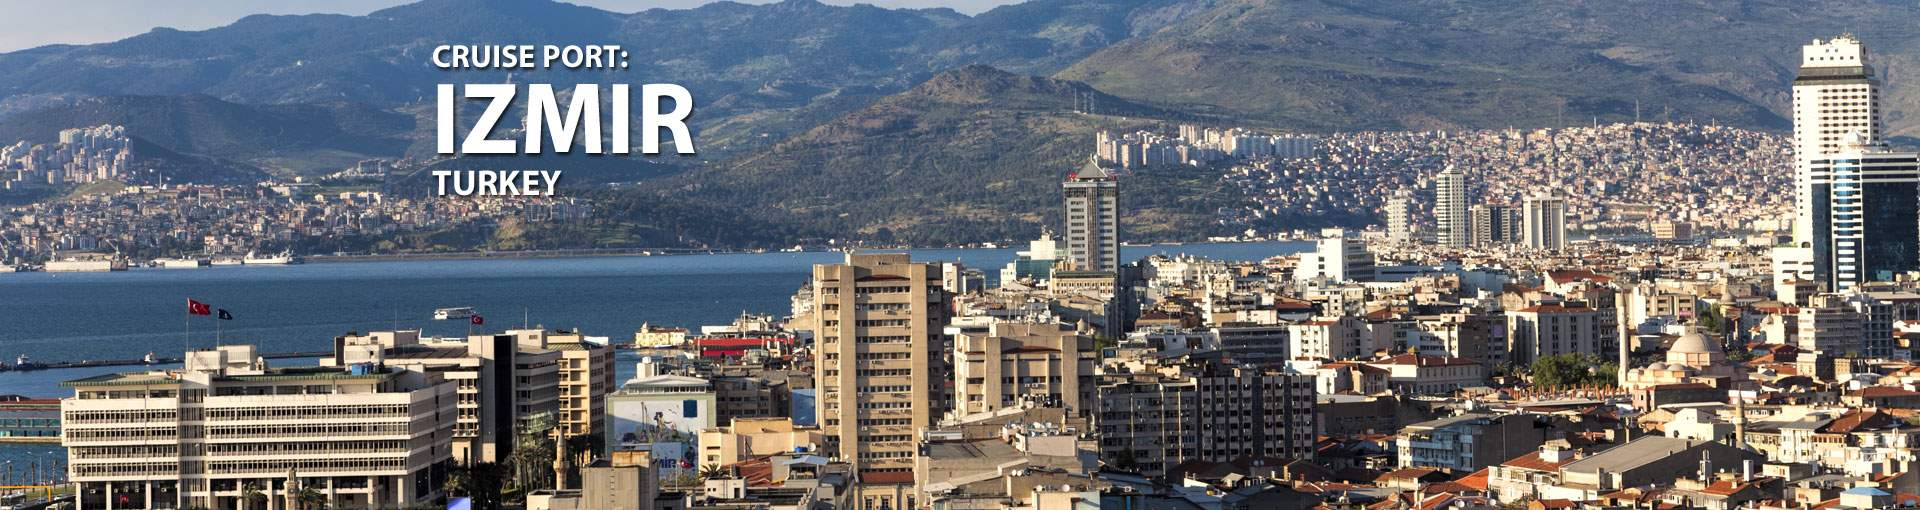 Cruises to Izmir, Turkey